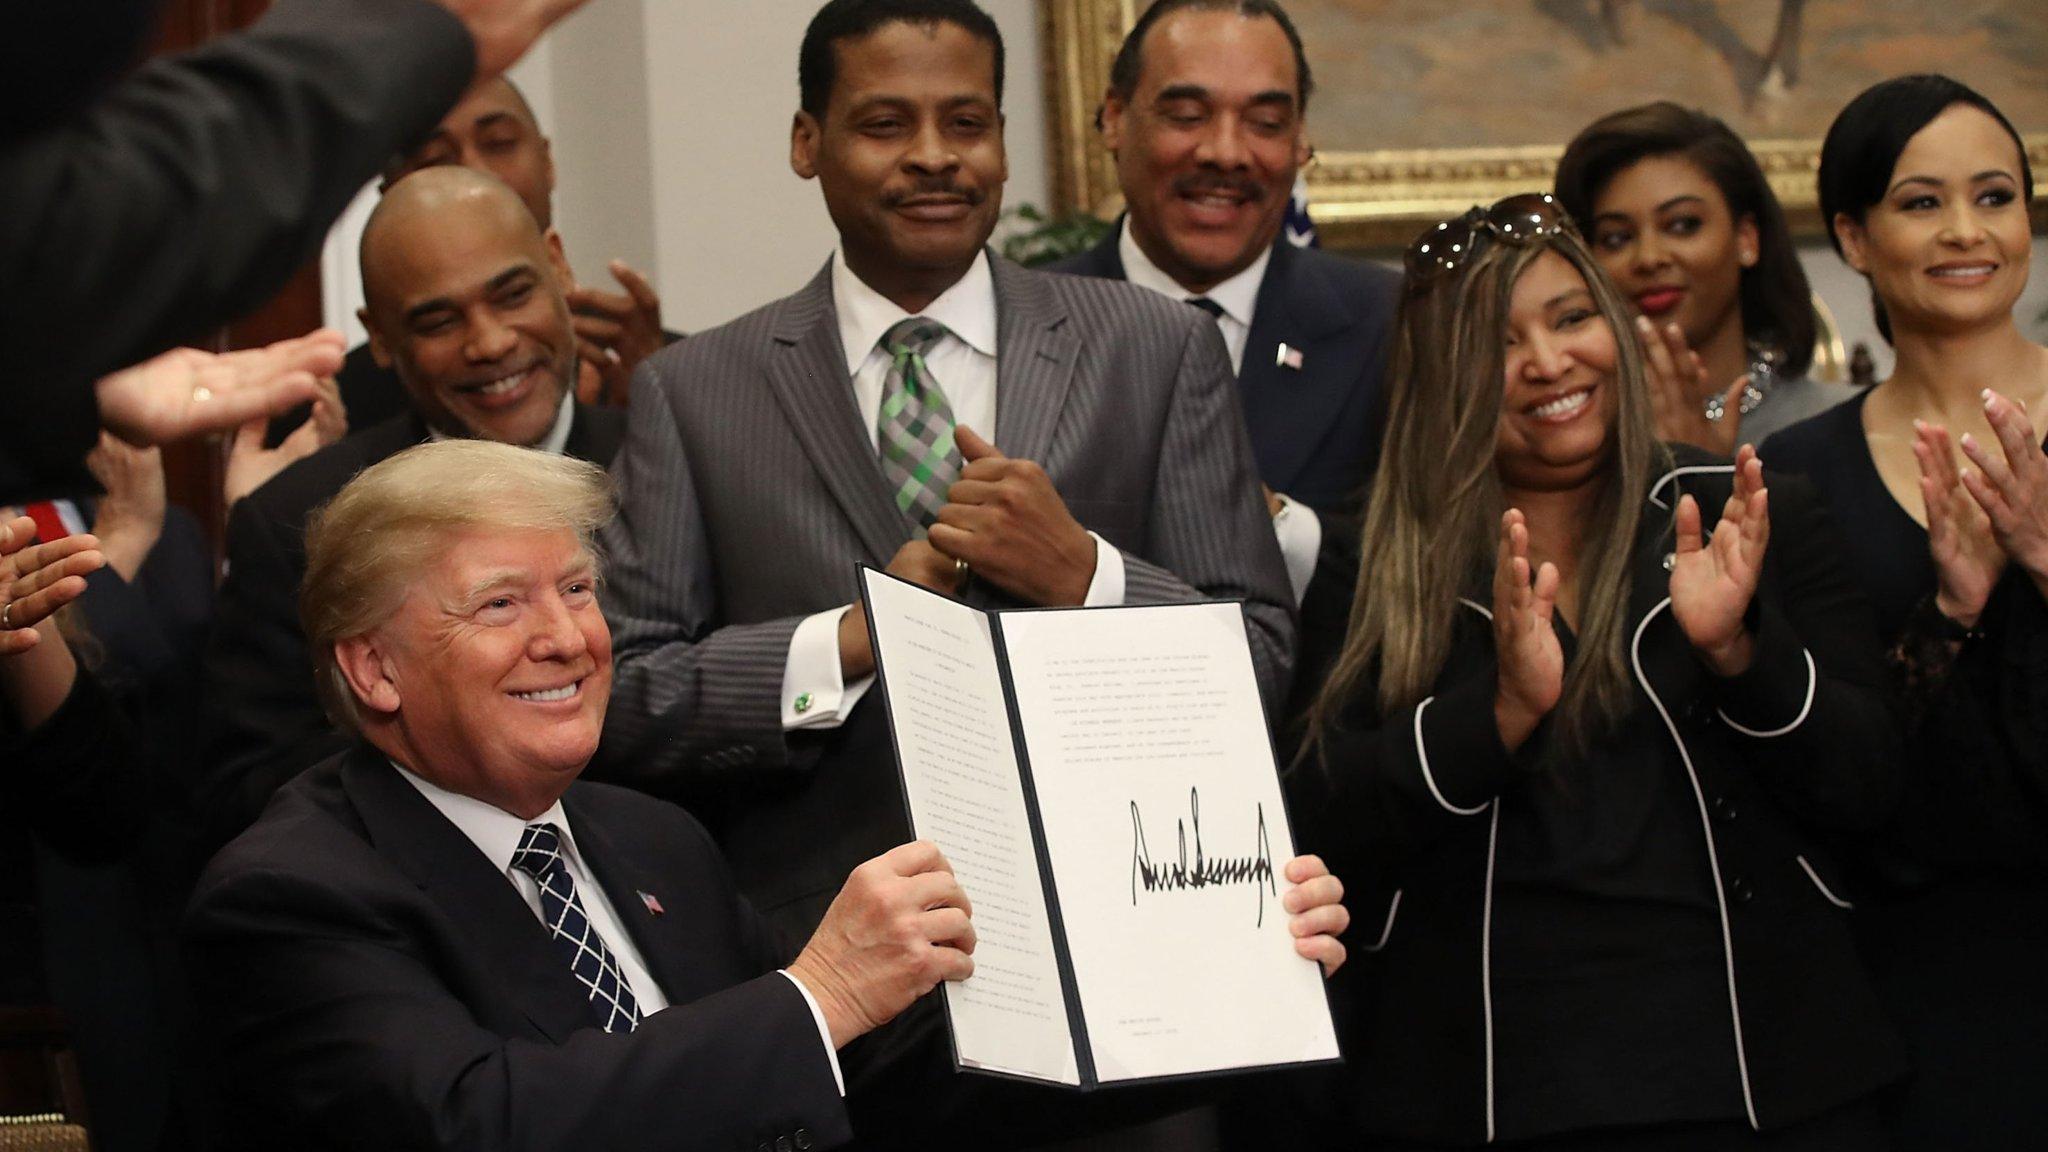 Trump unapologetic despite storm over 'racist' comments